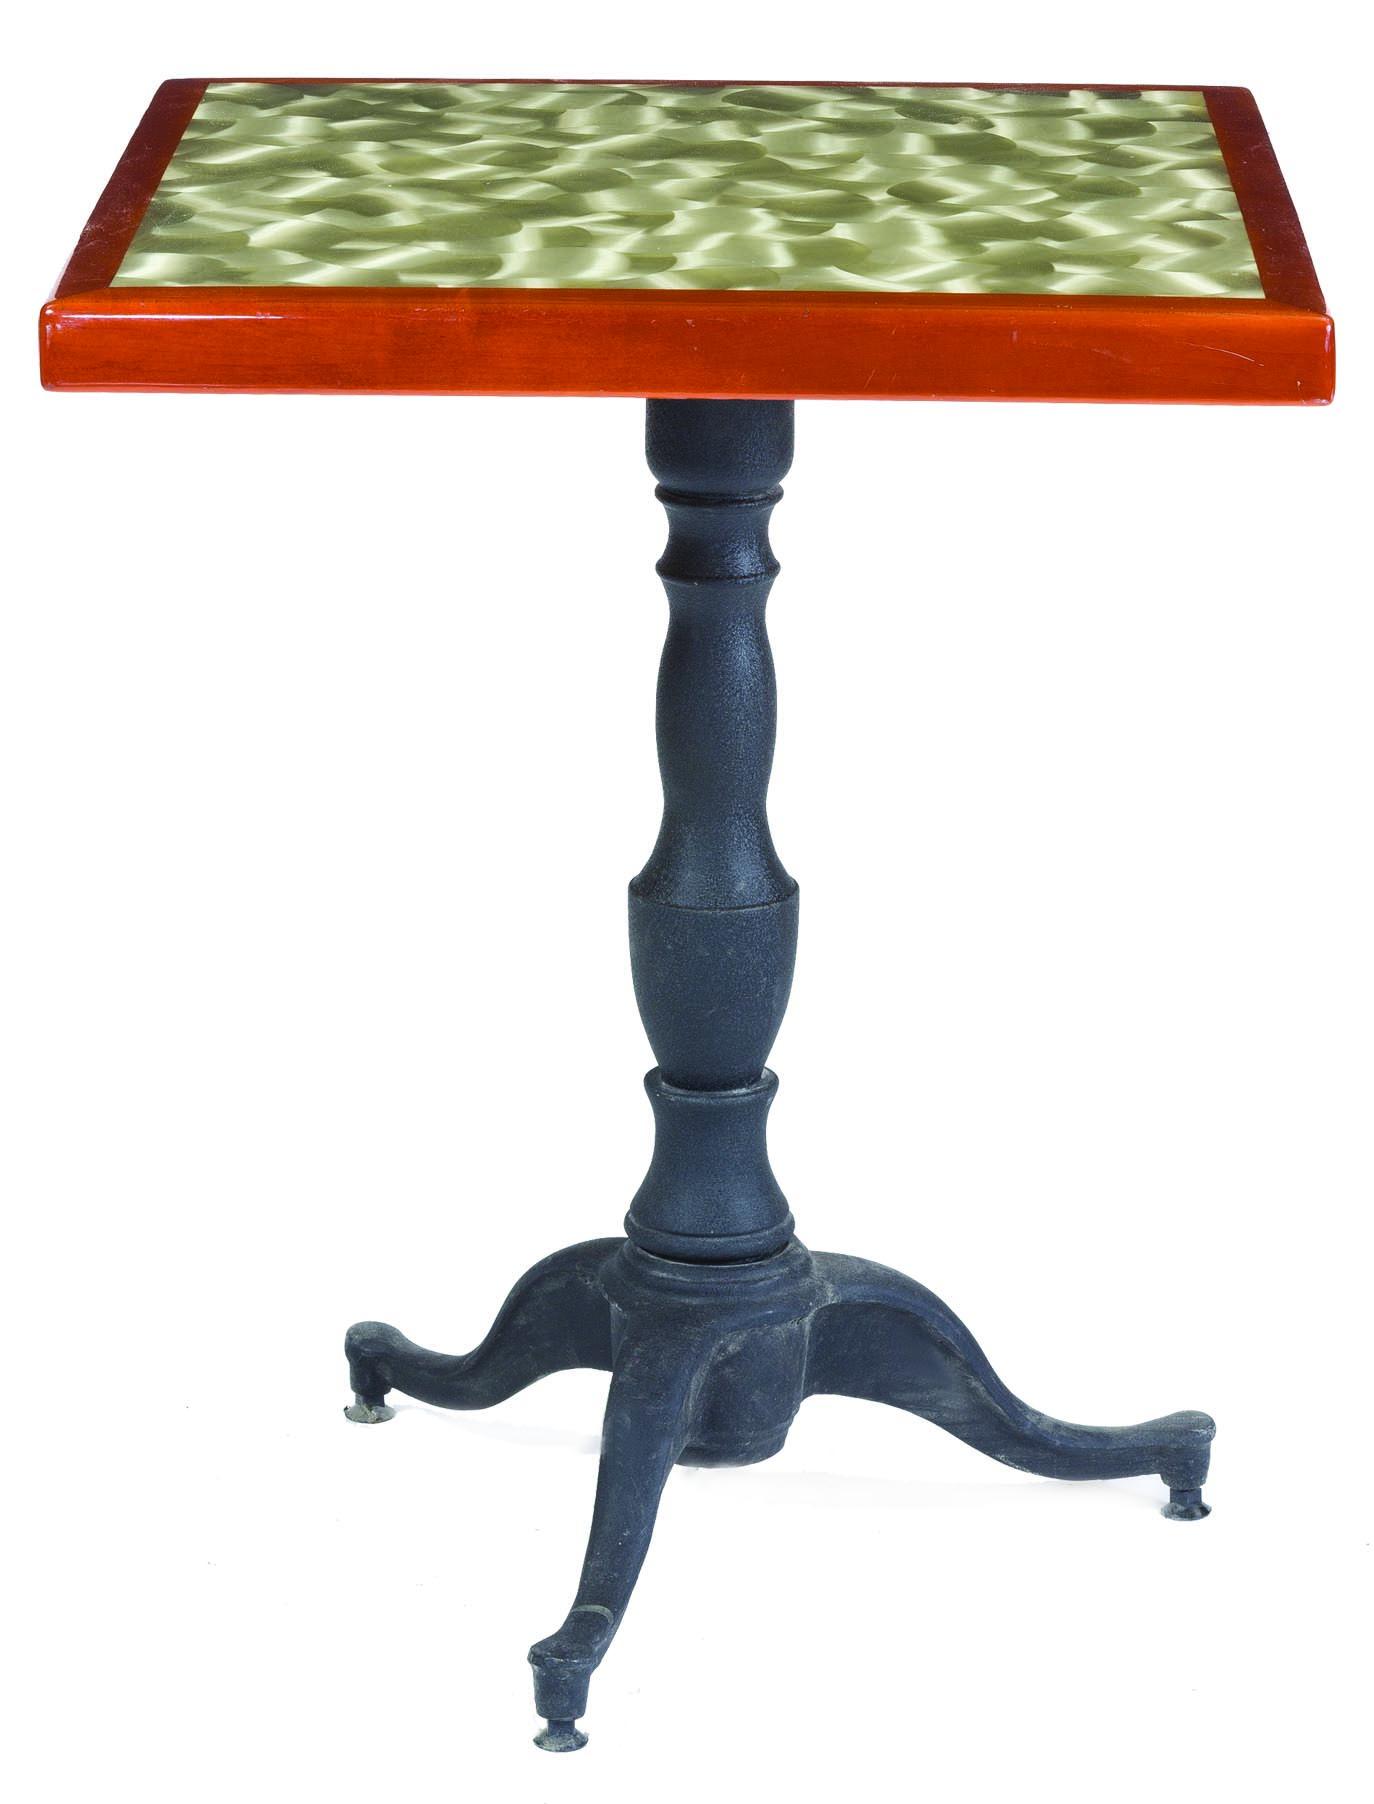 B6 - Cast Iron Table Base/ Steel Column